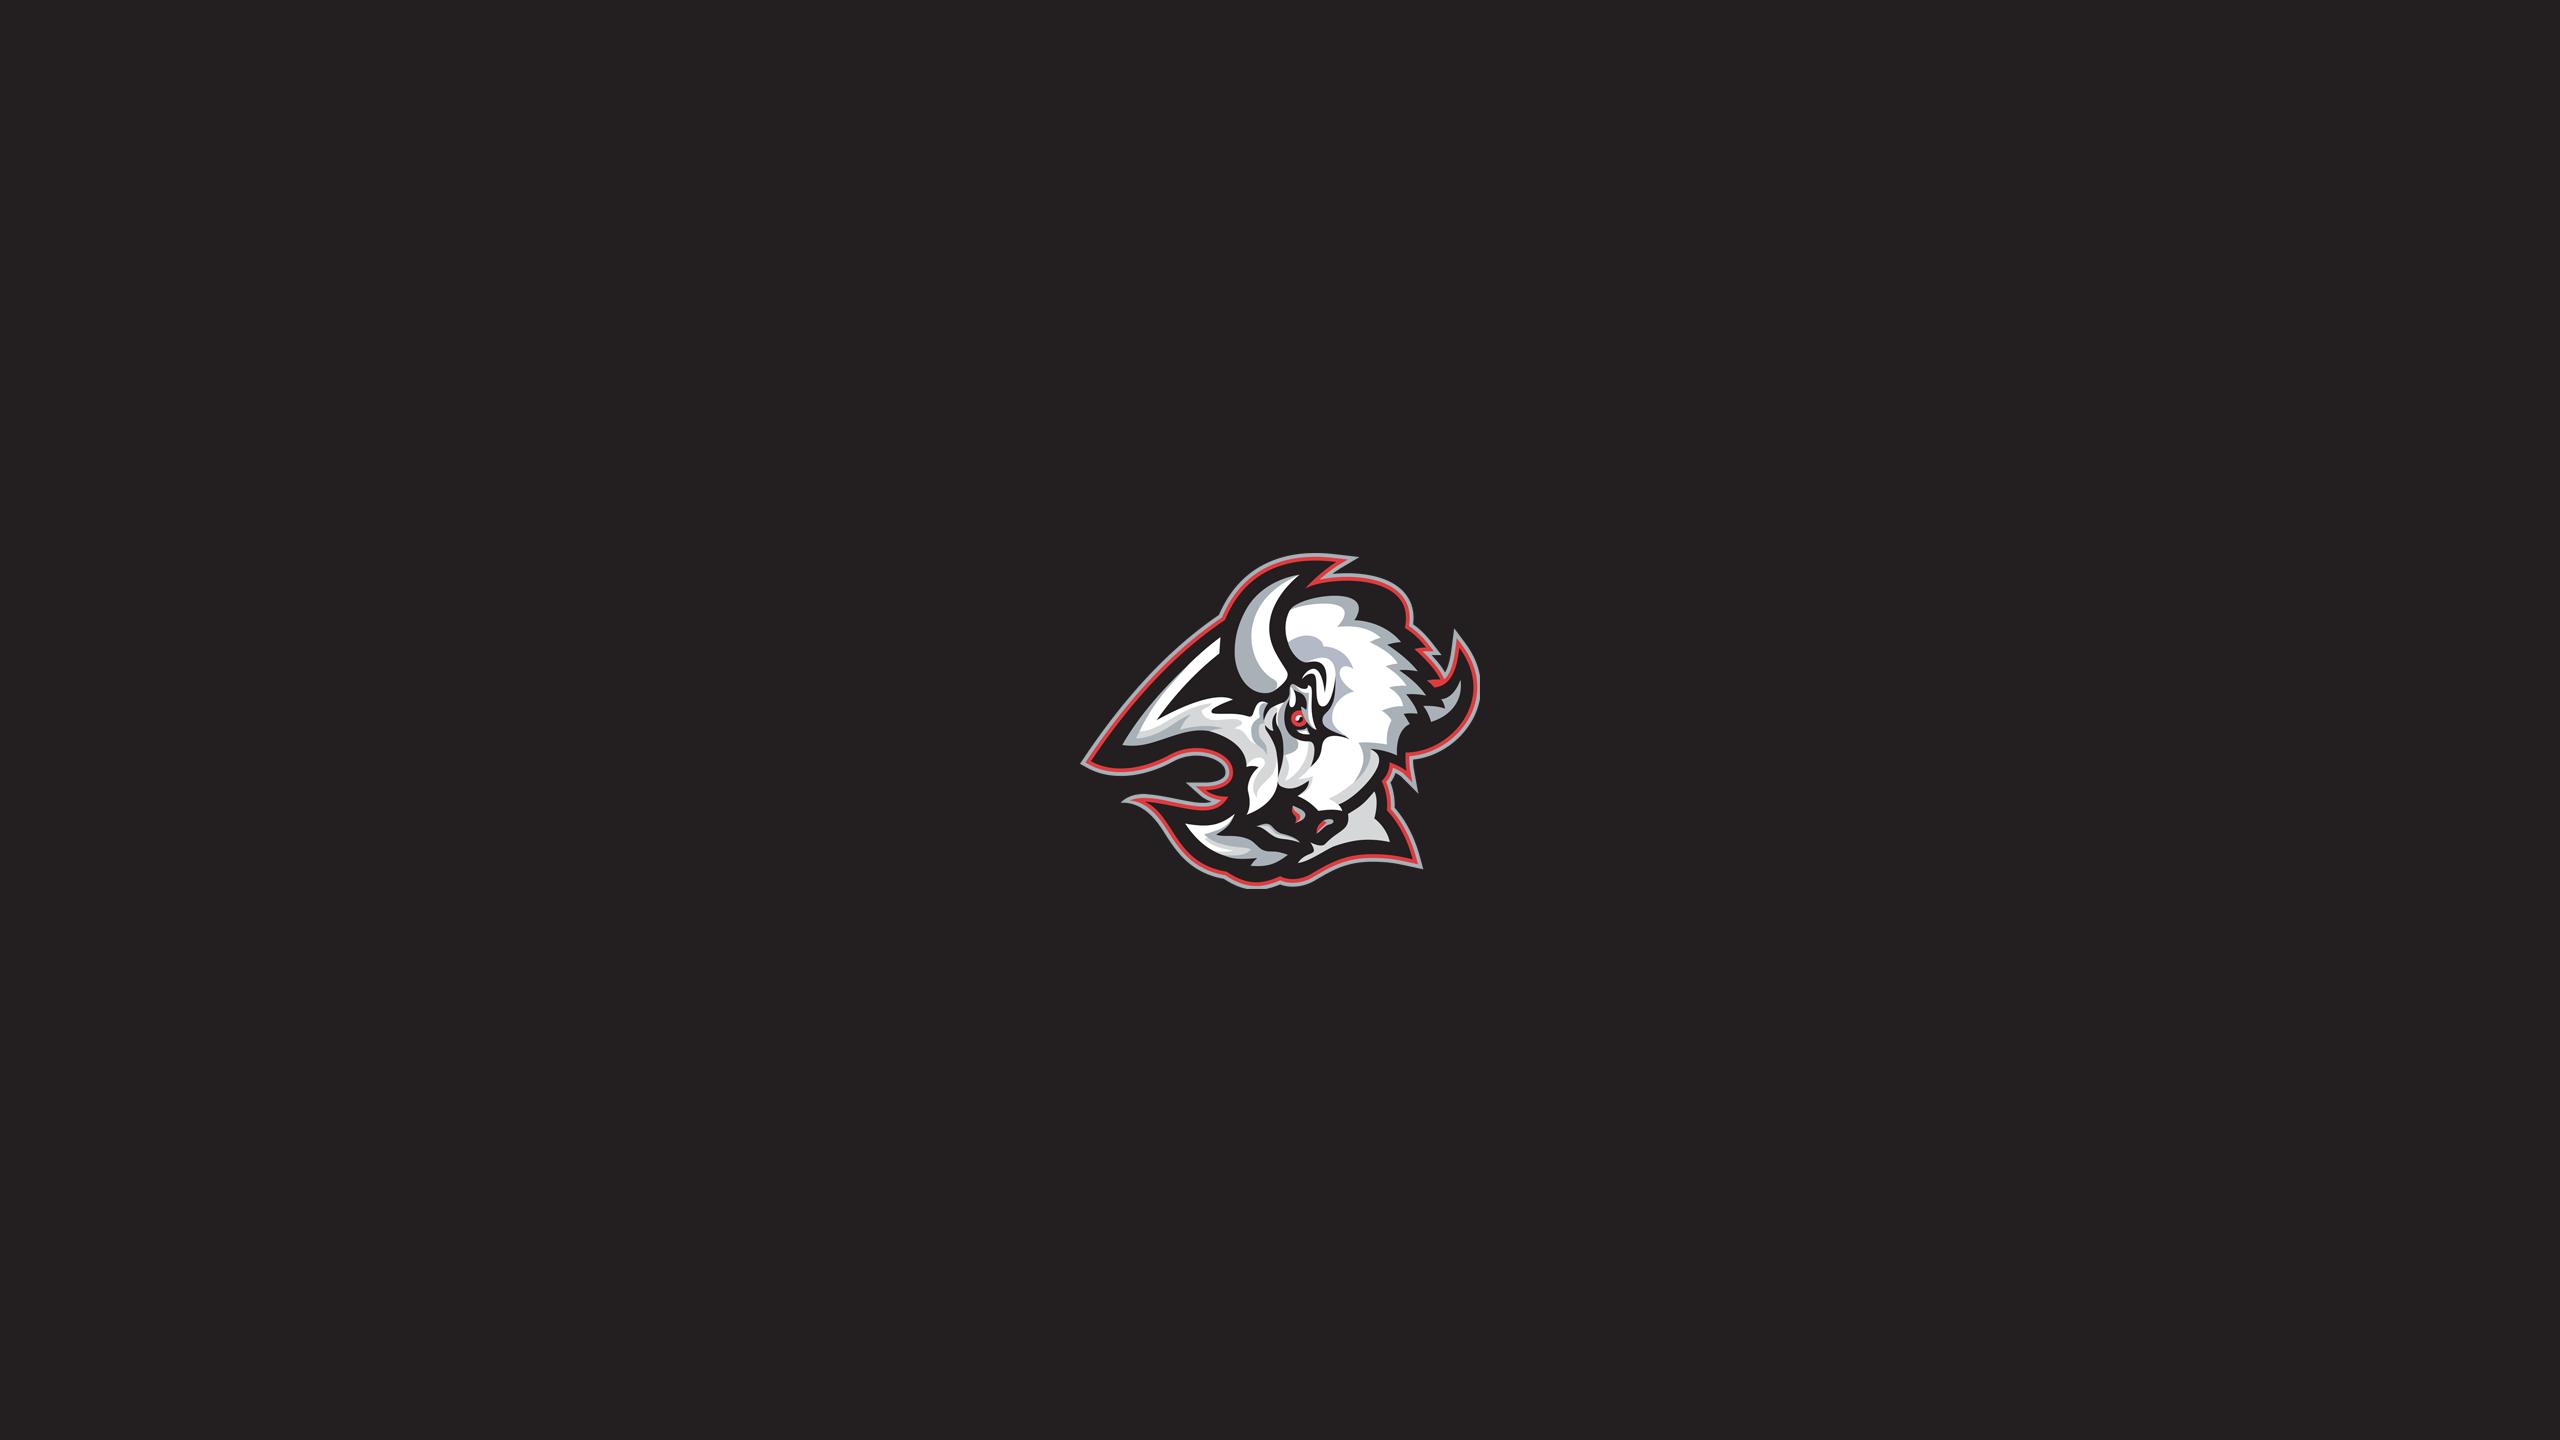 Buffalo Sabres (Hasek Era)